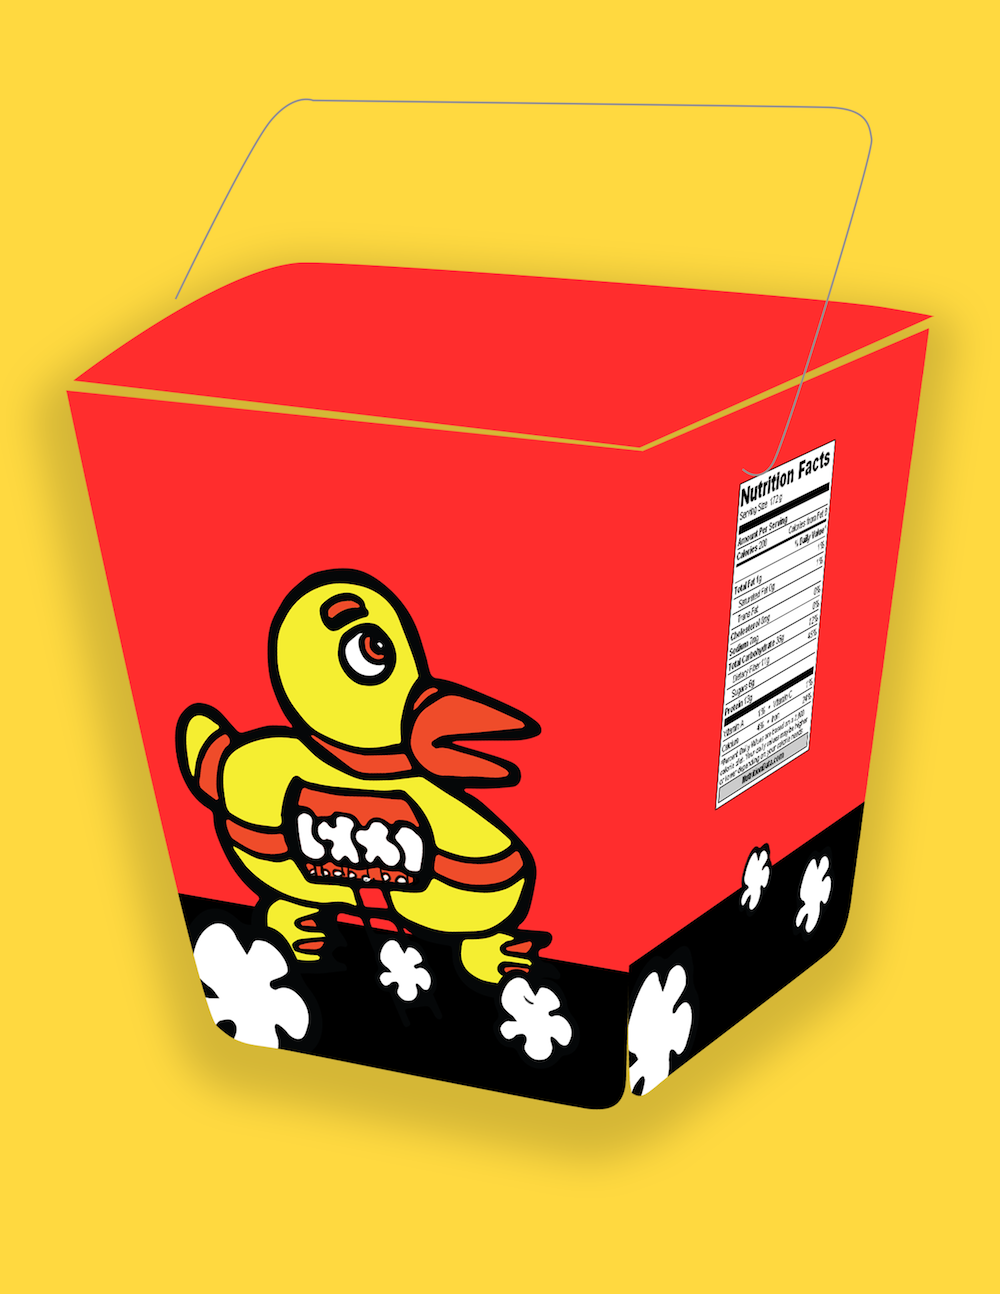 panda-snacks-popcorn_0001_Layer-Comp-2.png